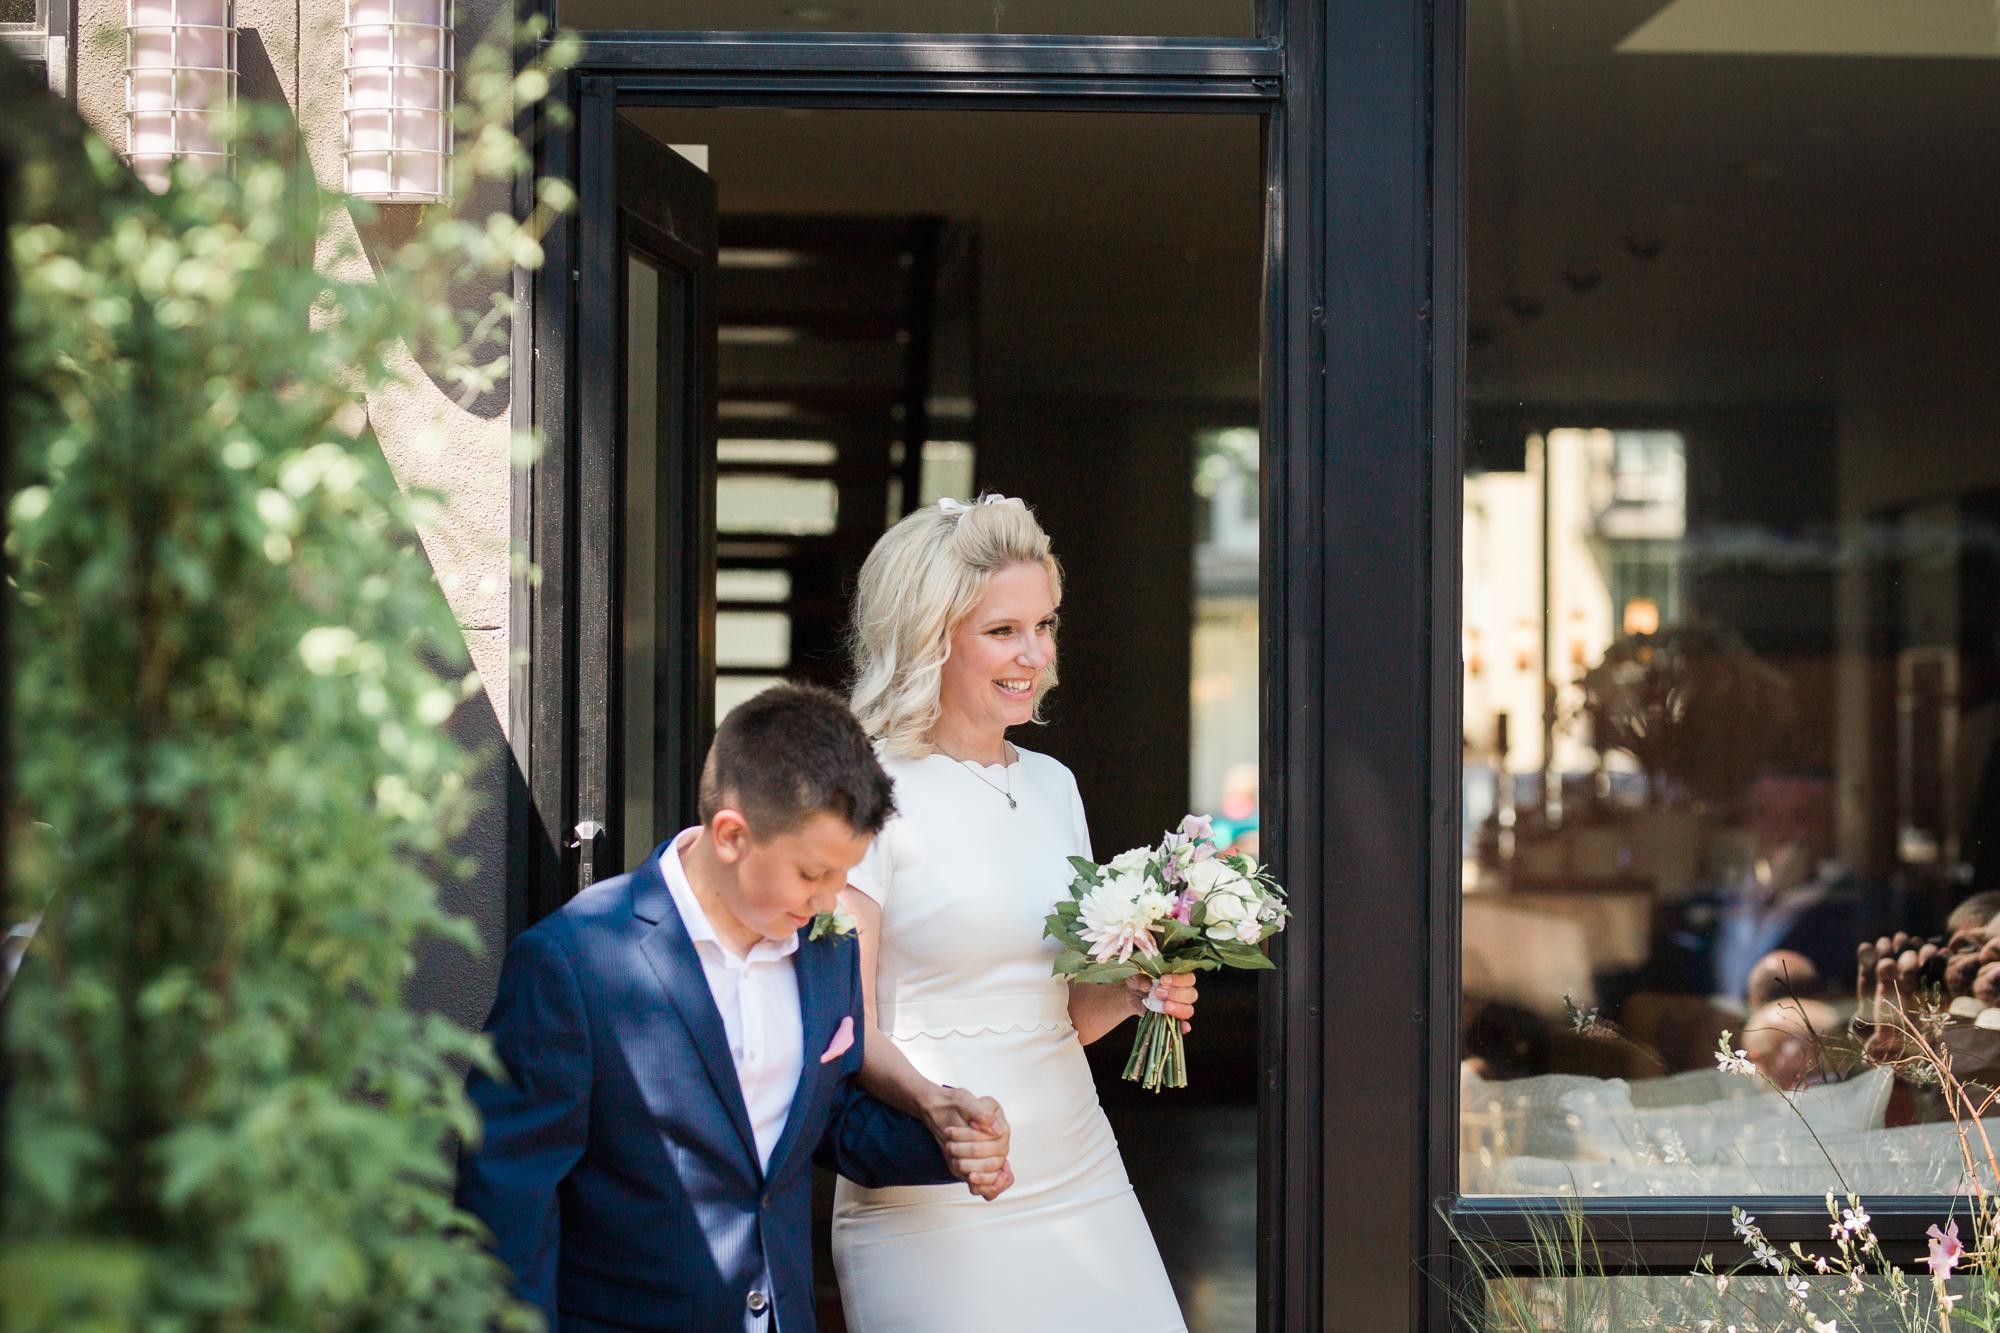 Calgary-wedding-photographer-CG-20.jpg